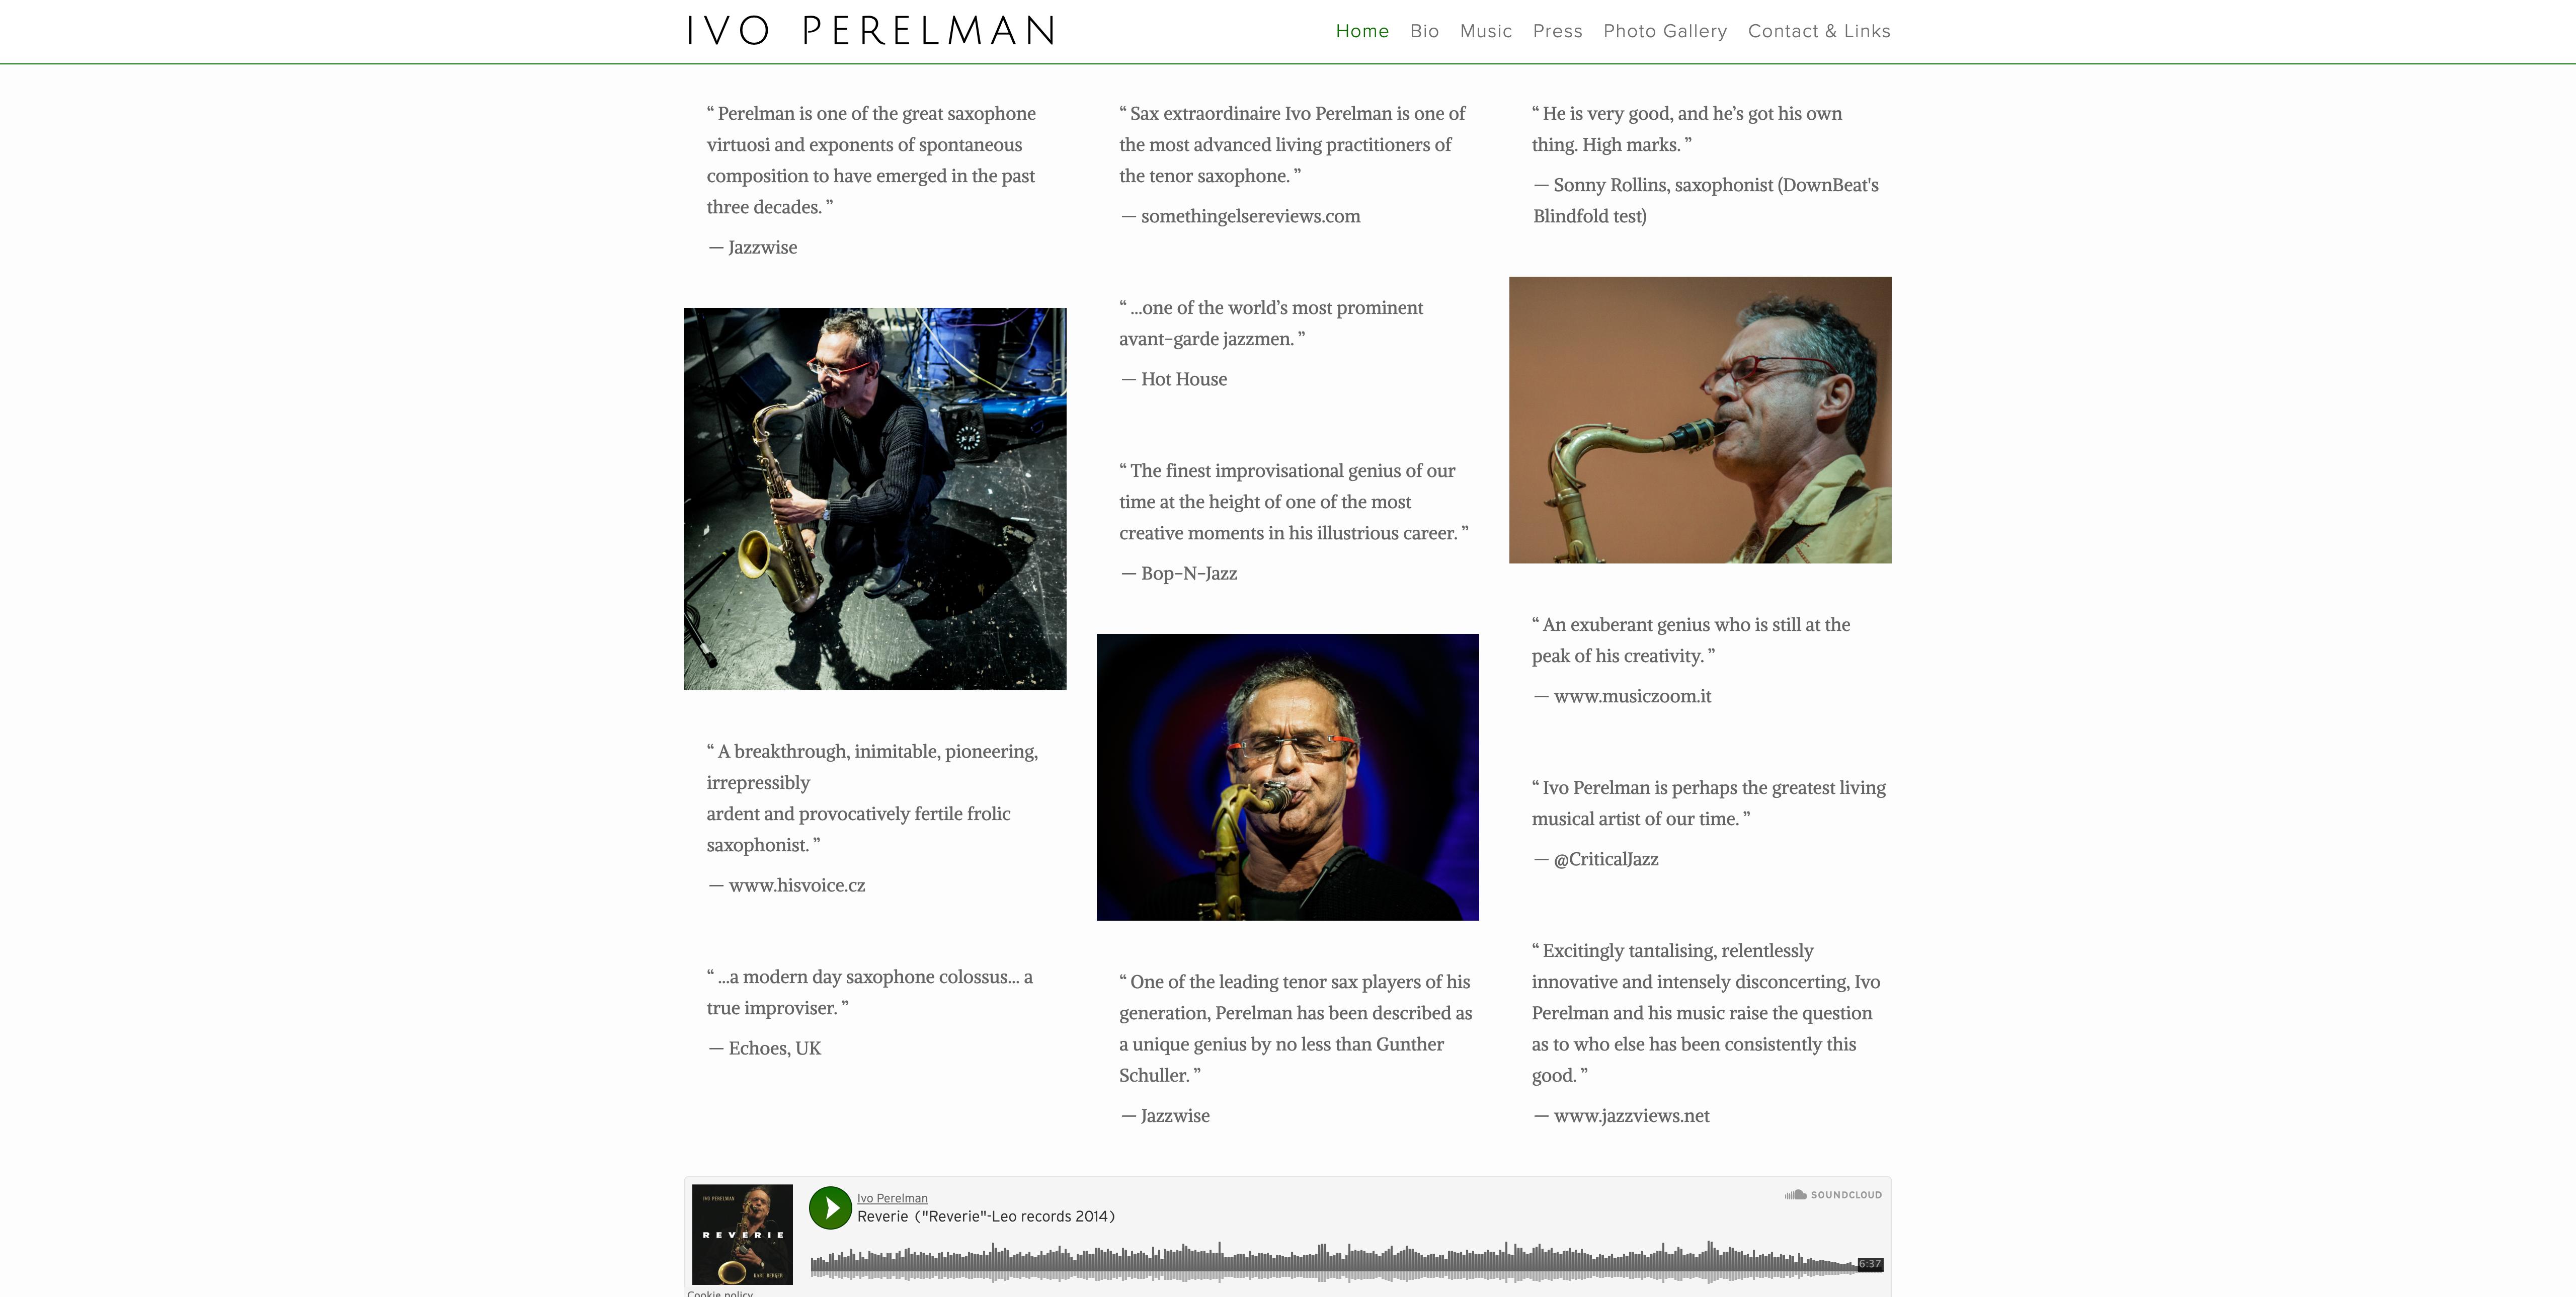 Ivo Perelman - Musician